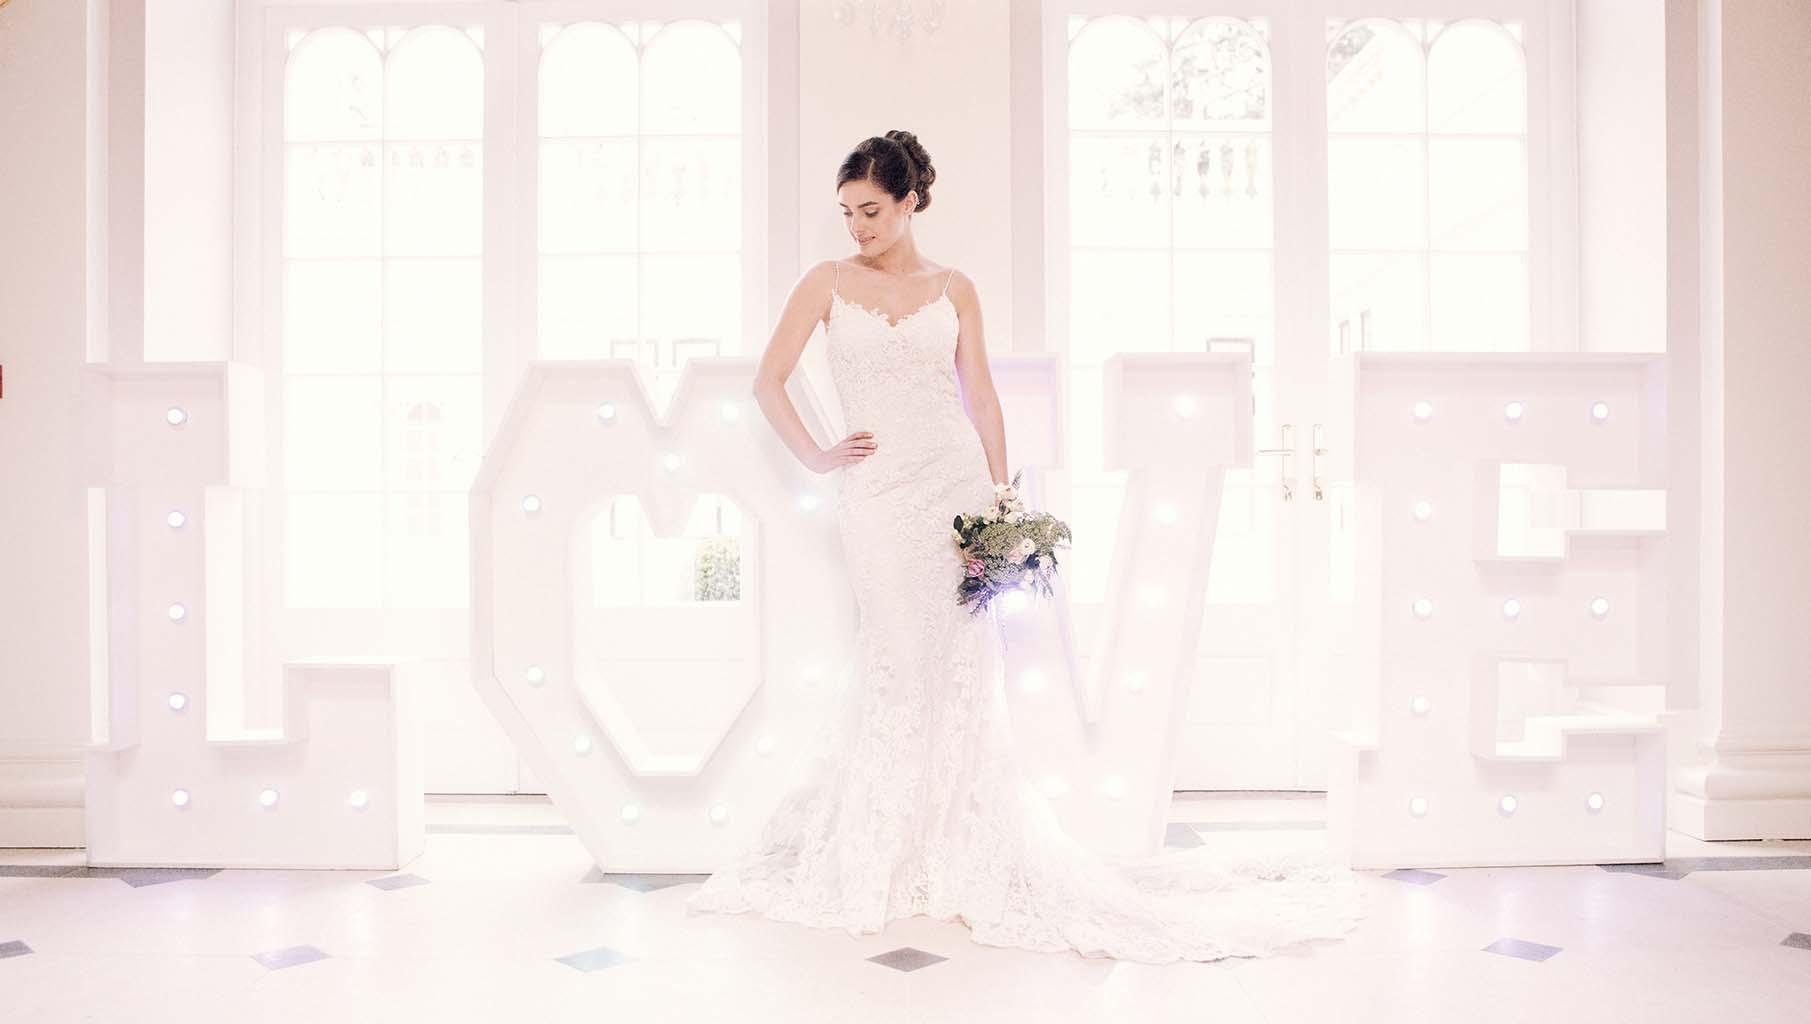 Rushton Hall Wedding Fair